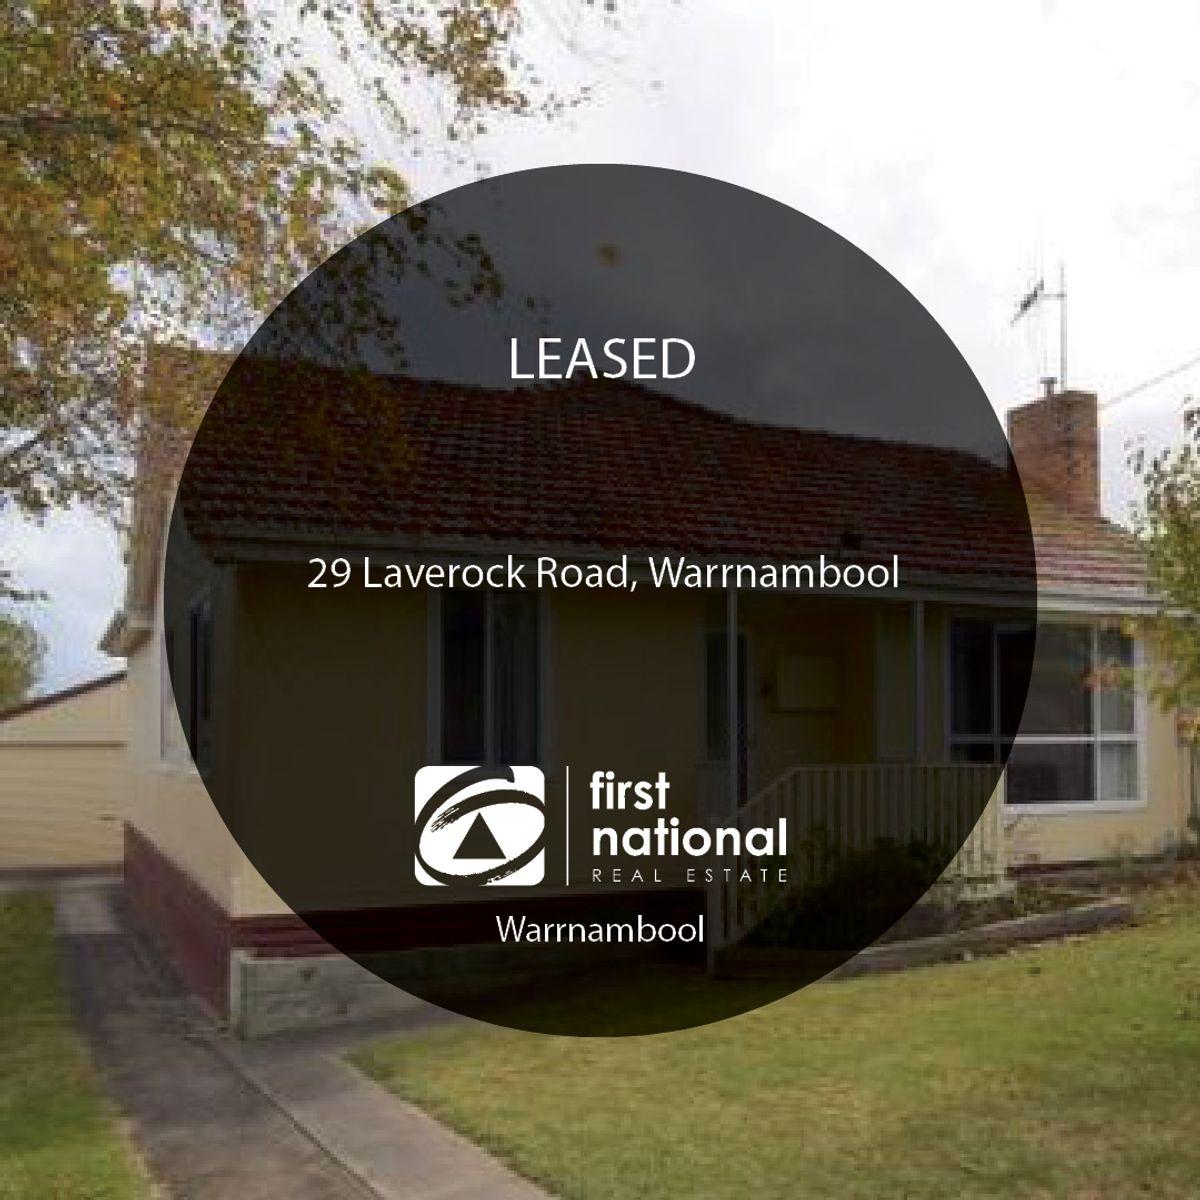 29/Laverock  Road, Warrnambool, VIC 3280